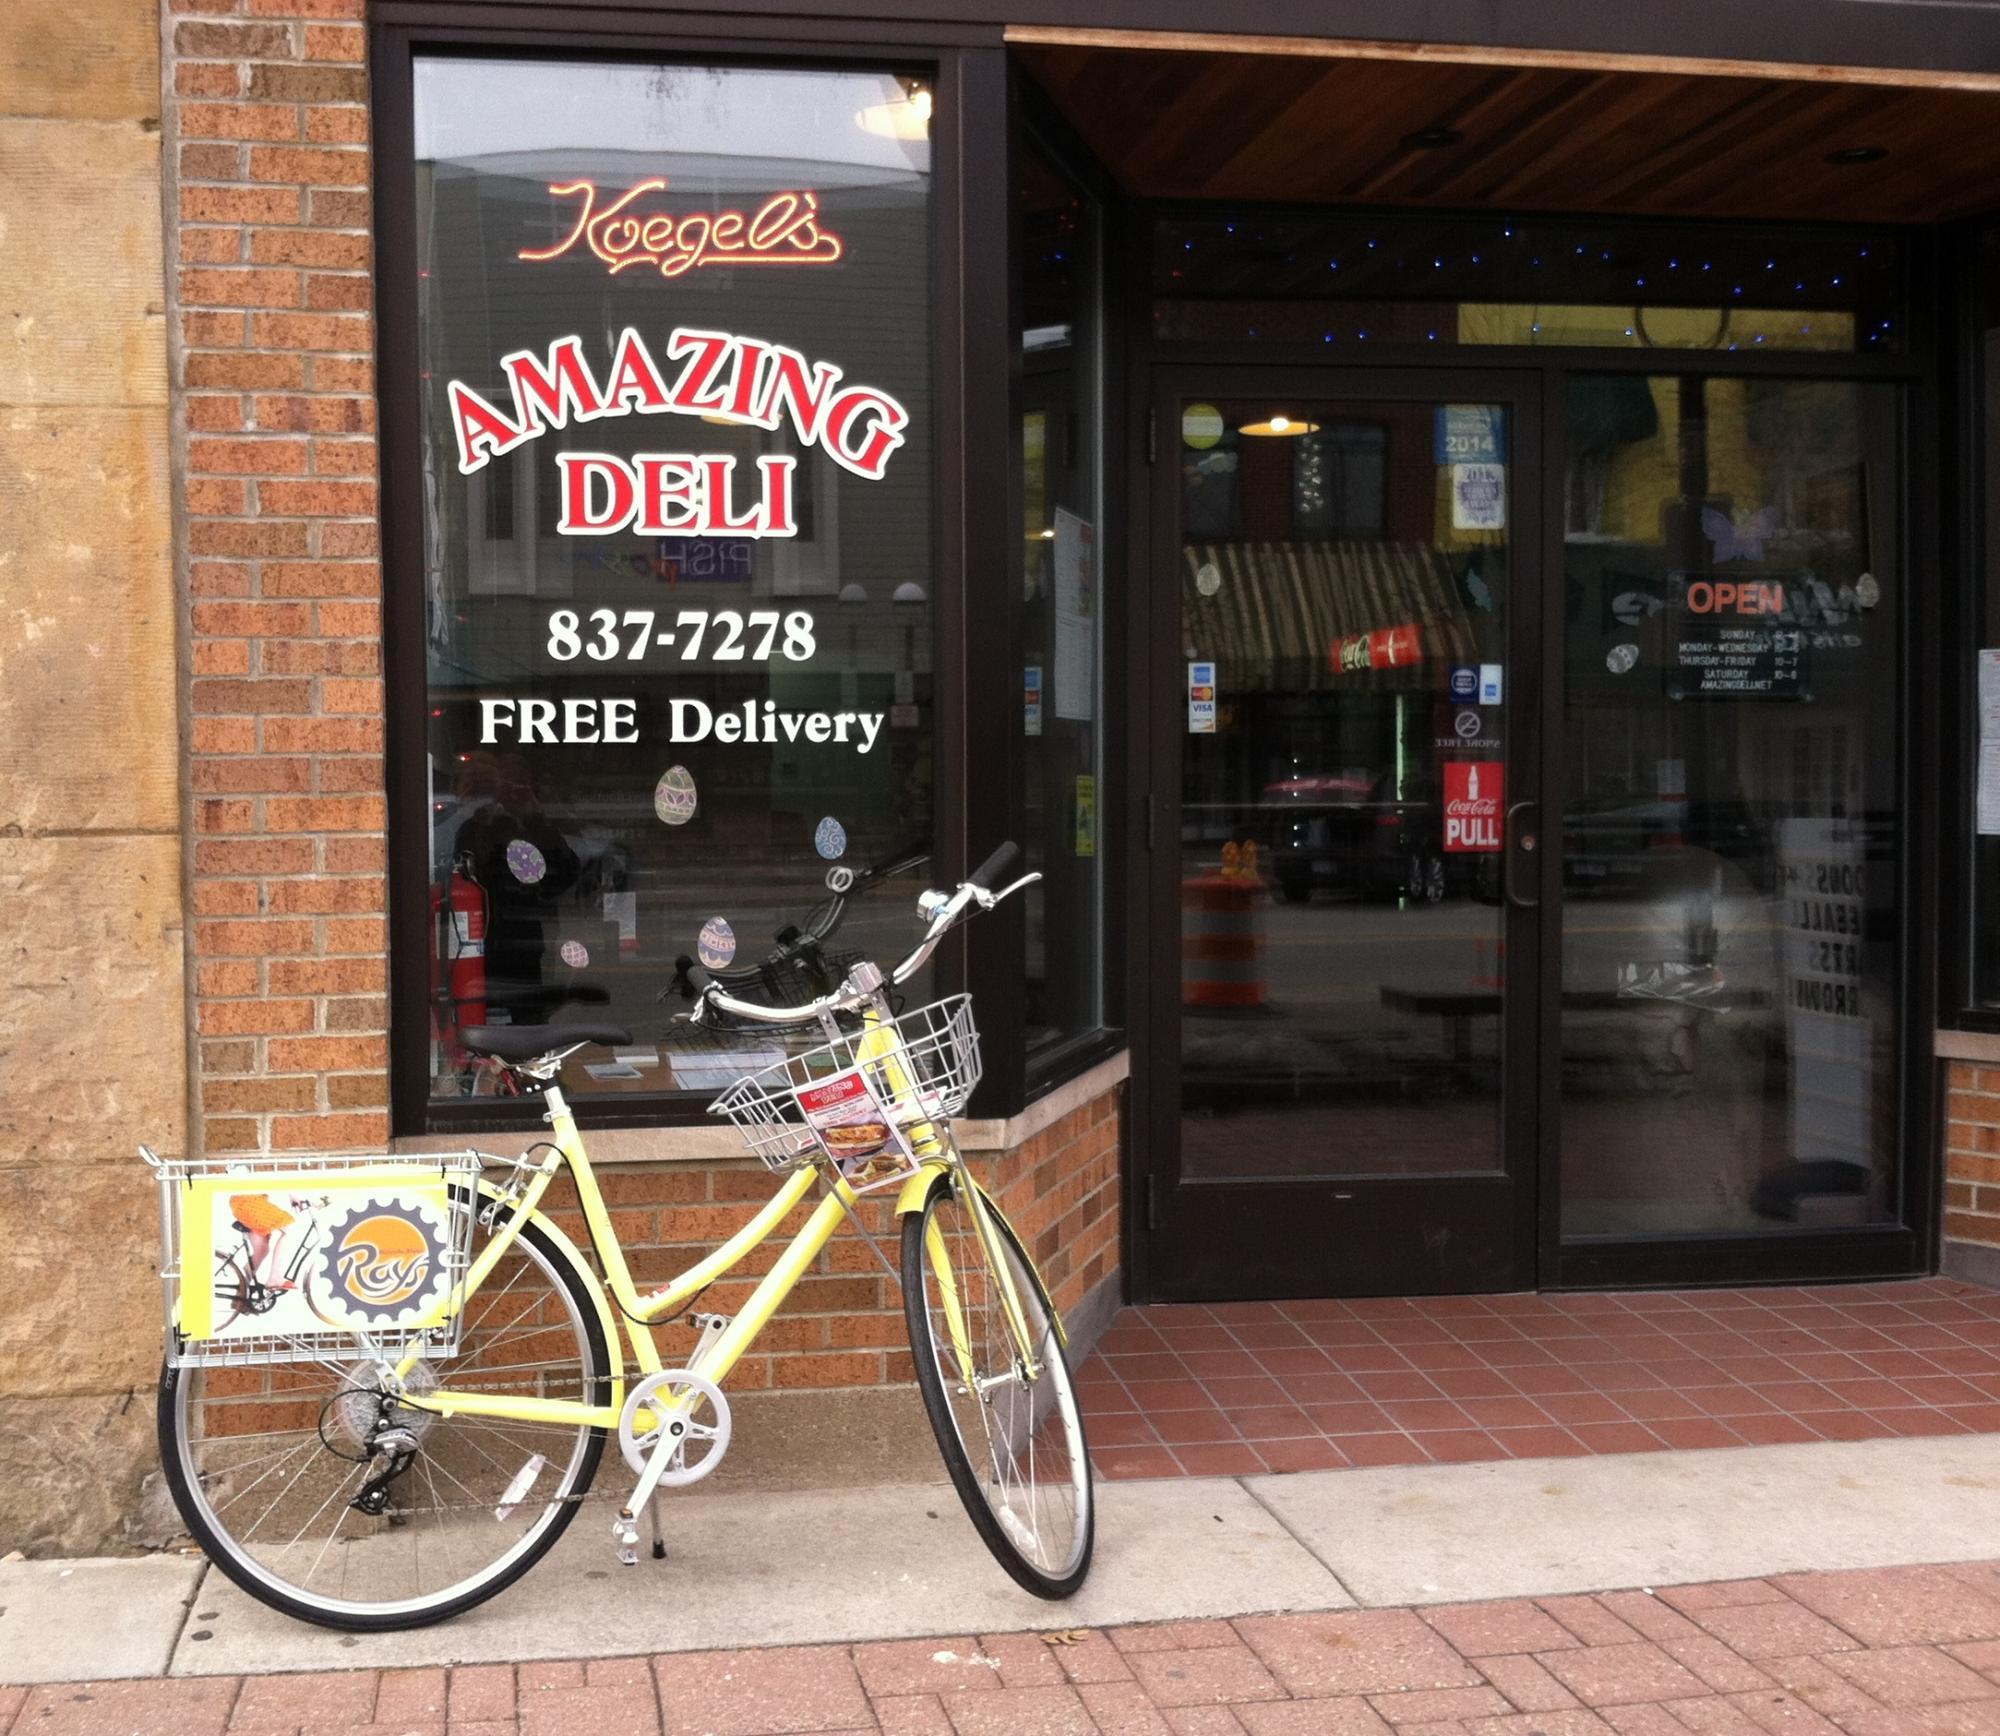 Amazing Deli Downtown- Midland, MI